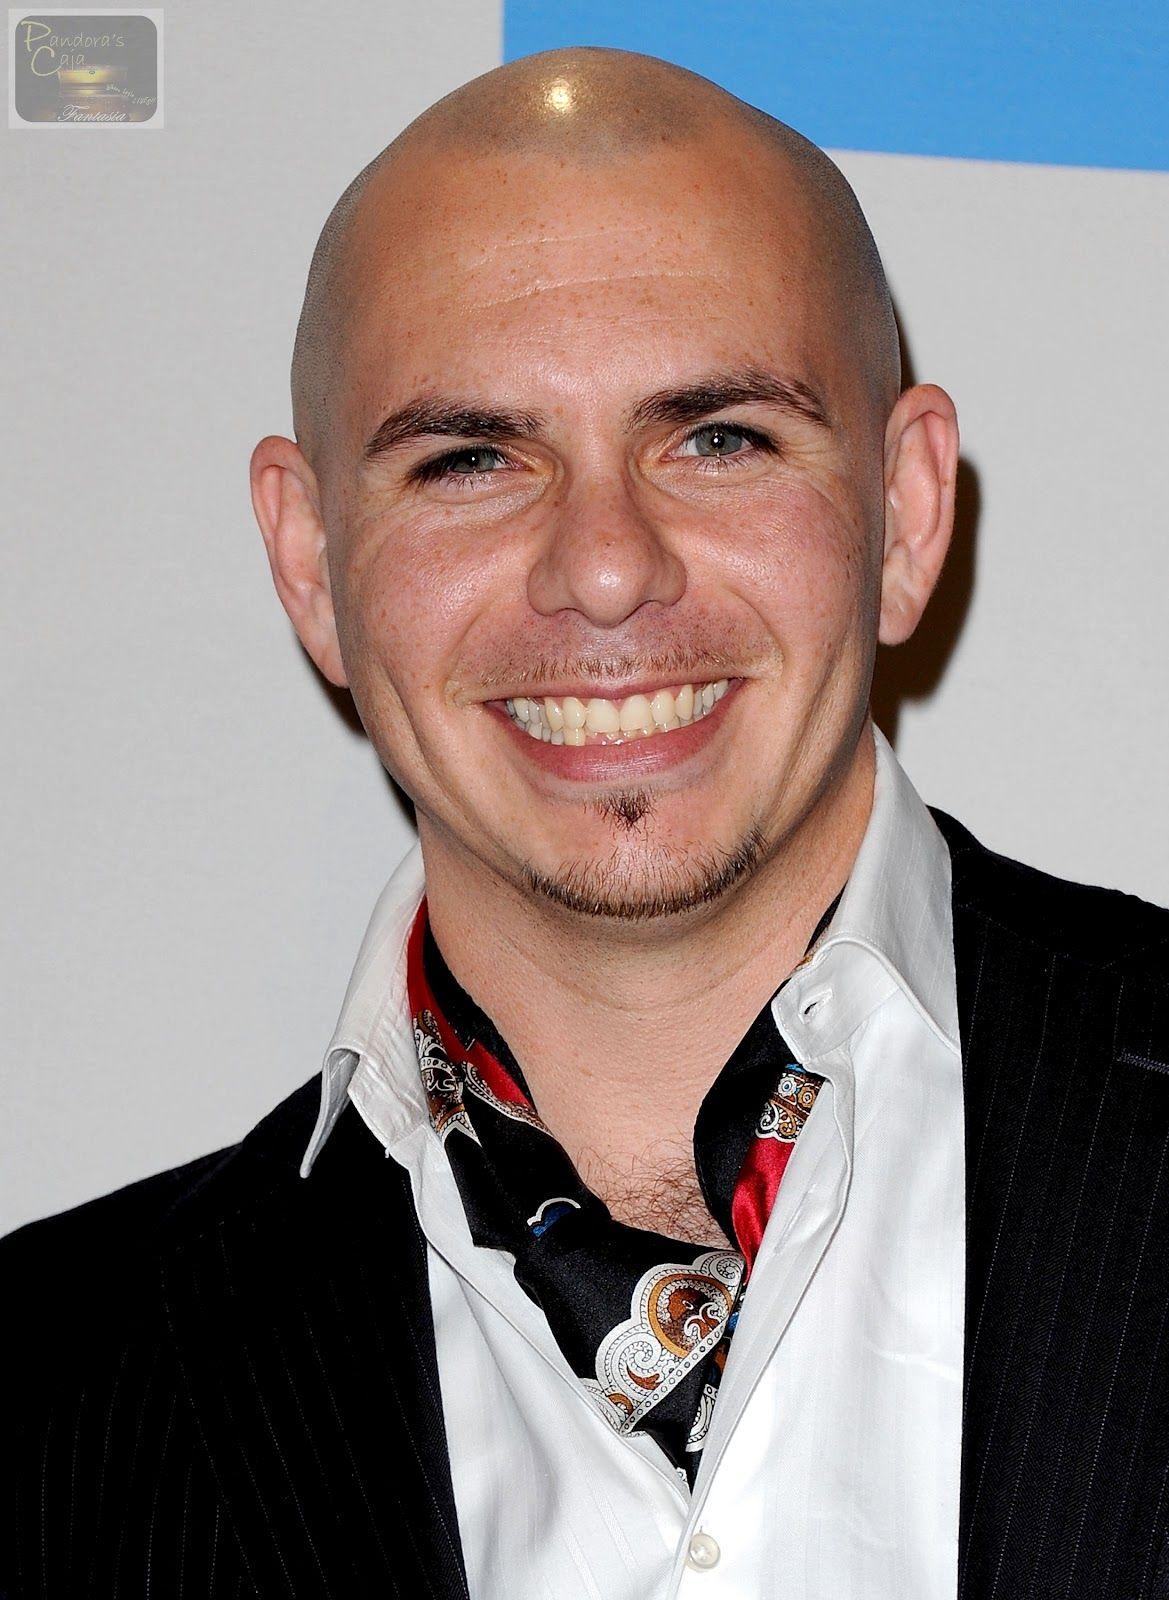 Photo Pitbull Singer 2014 HD Wallpaper IPhone 5 Pitbulls